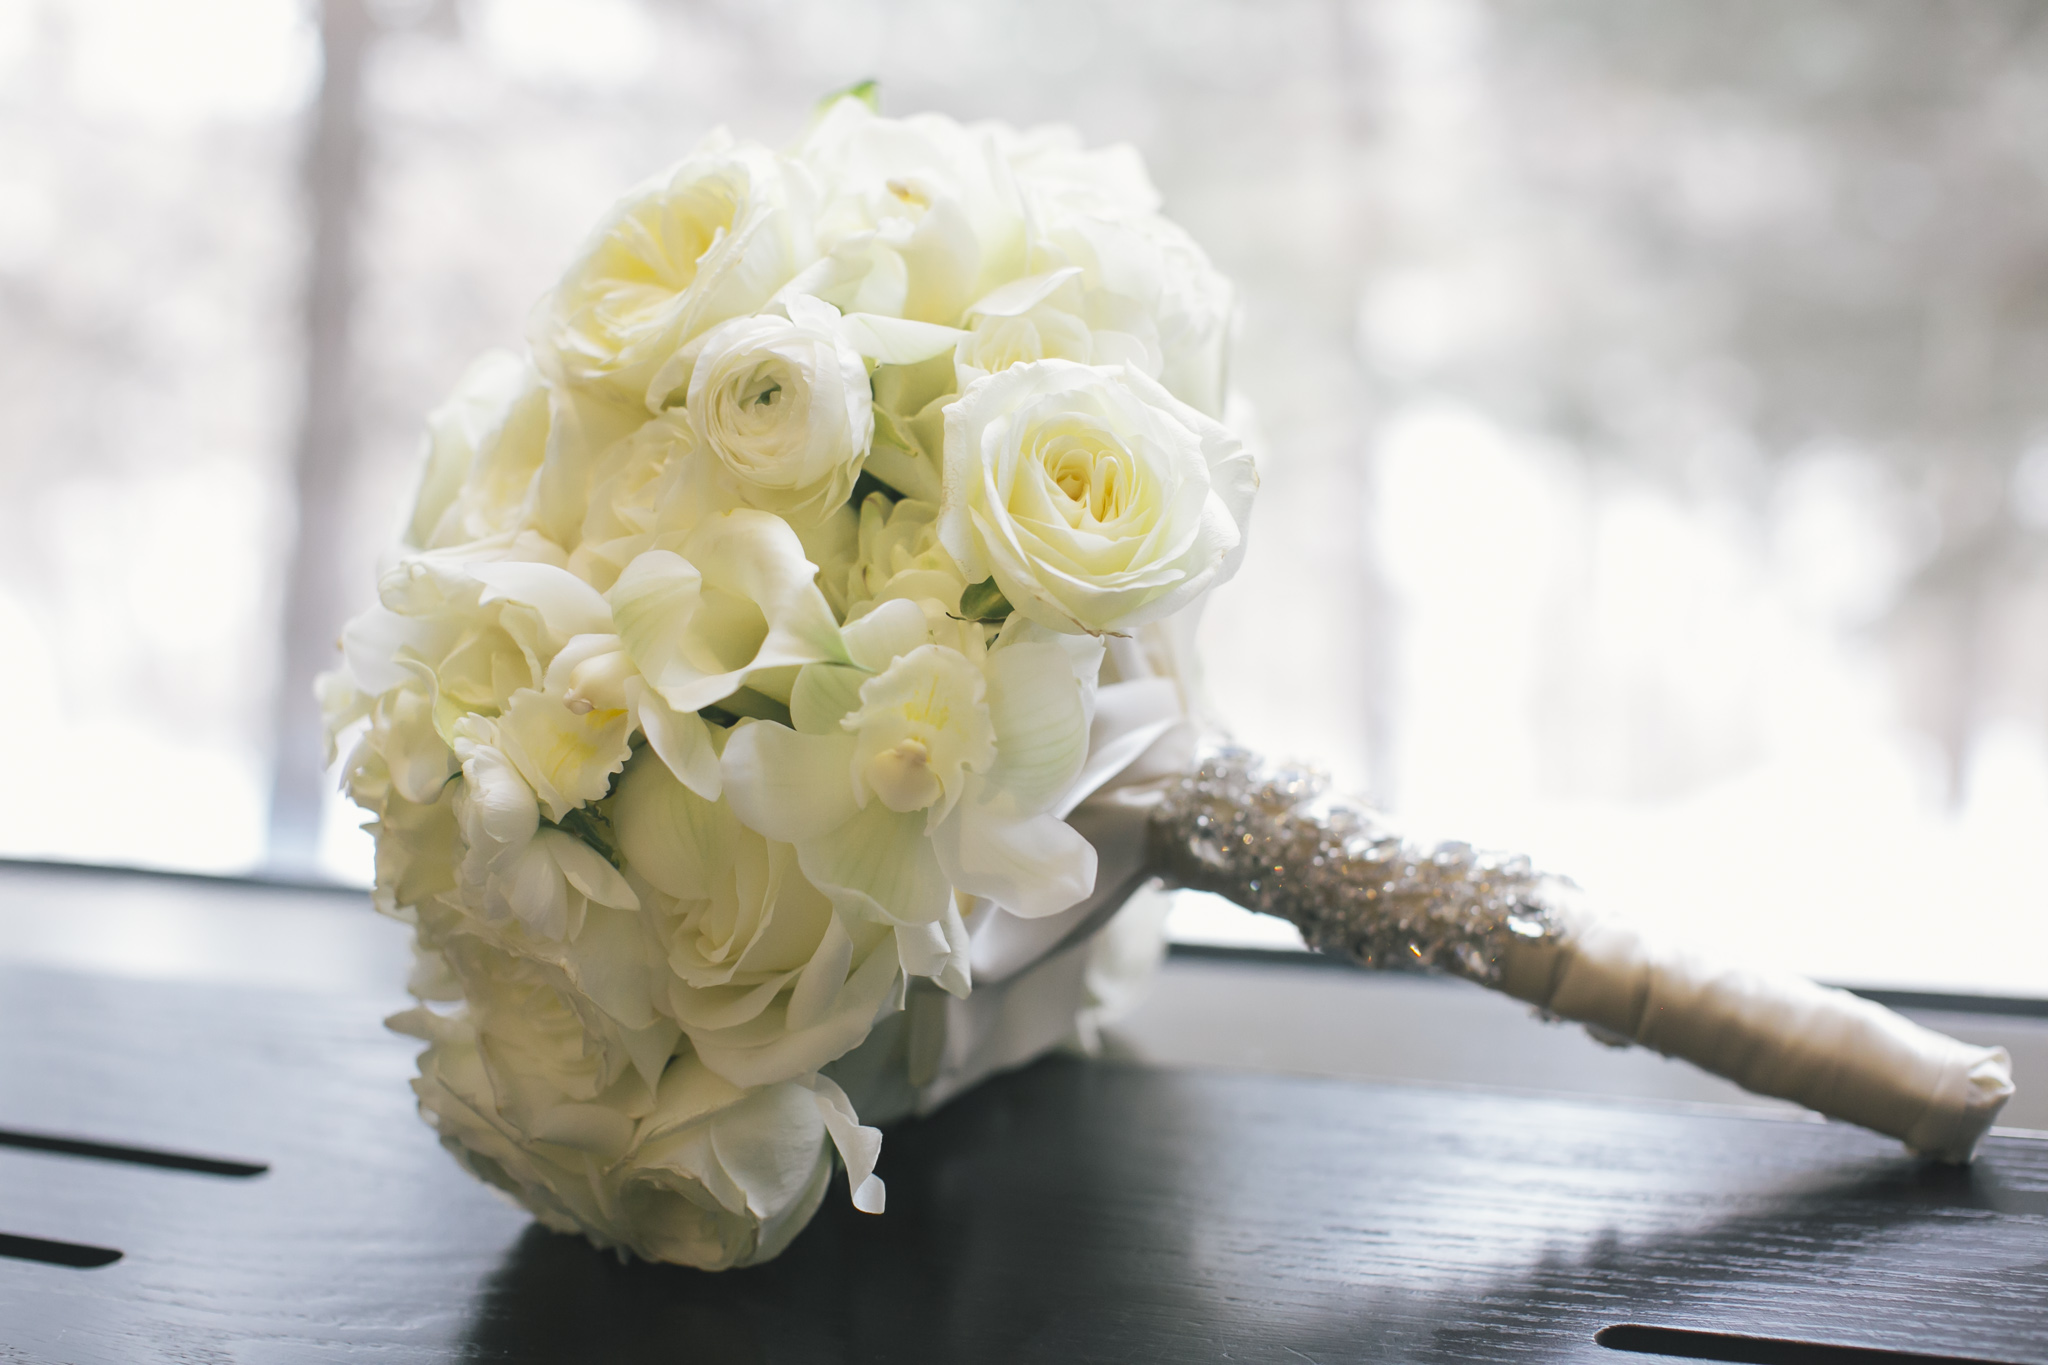 melissa's bouquet.jpg